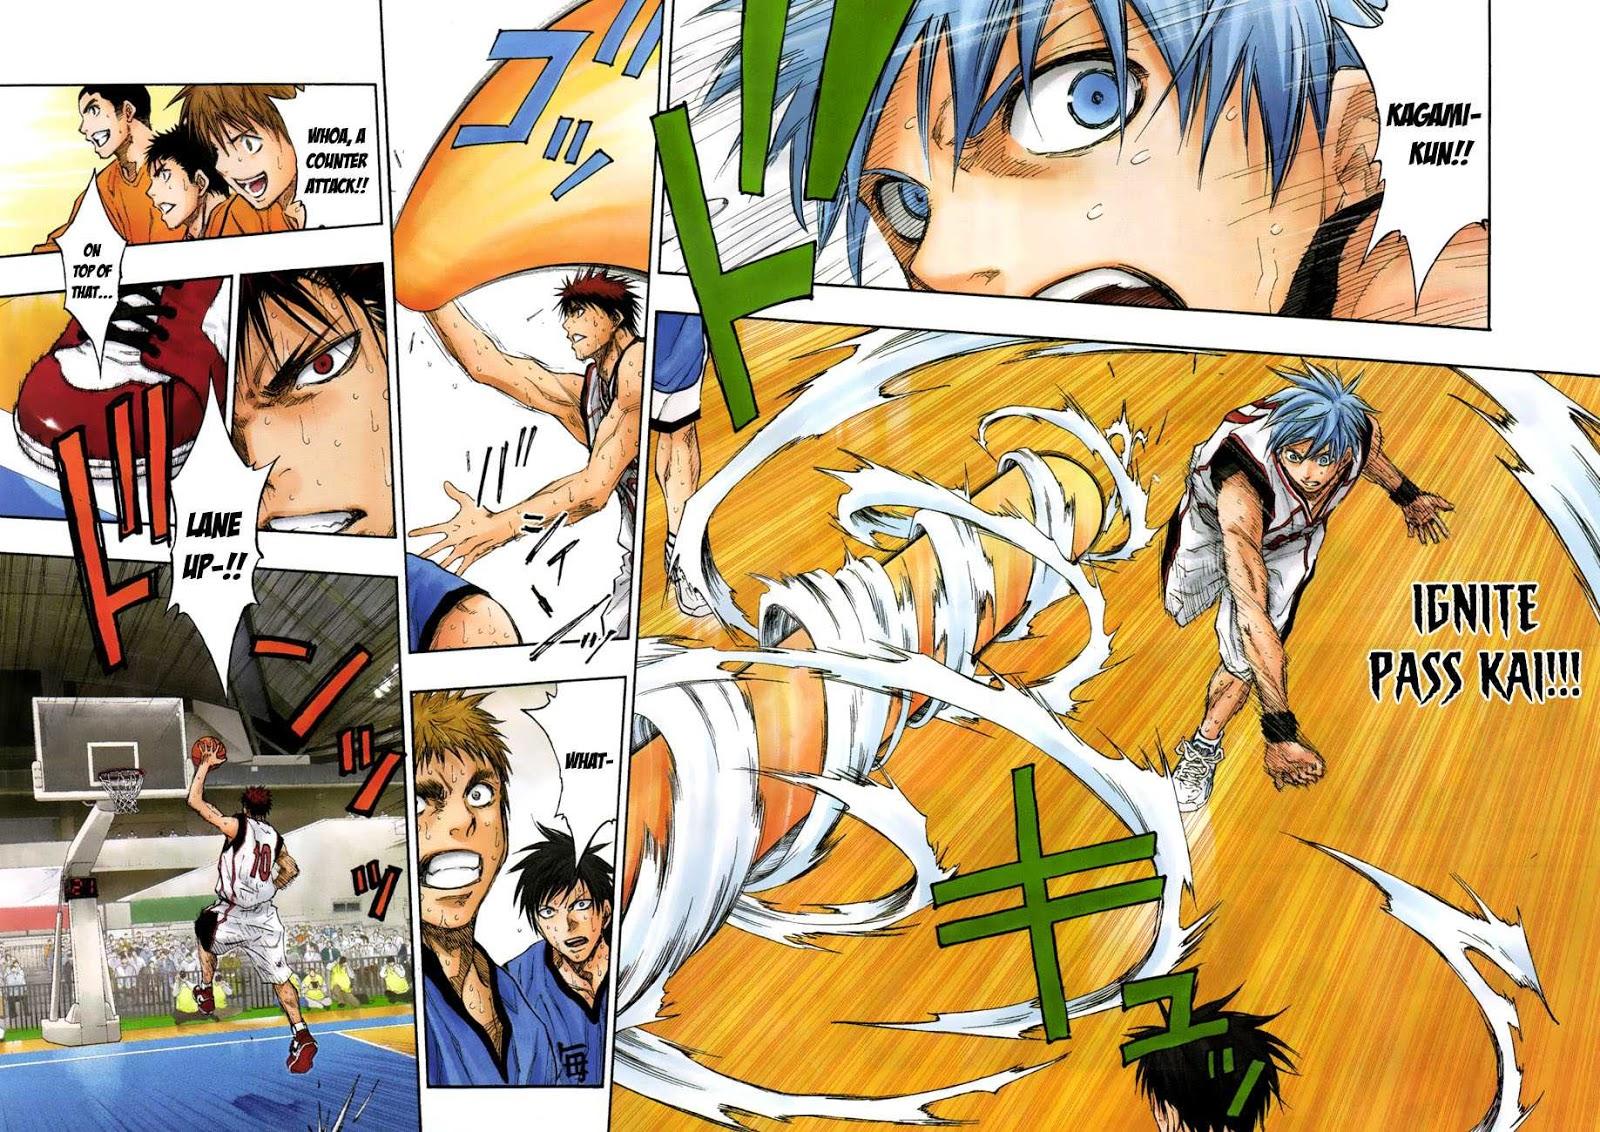 Kuroko no Basket Manga Chapter 196 - Image 12-13